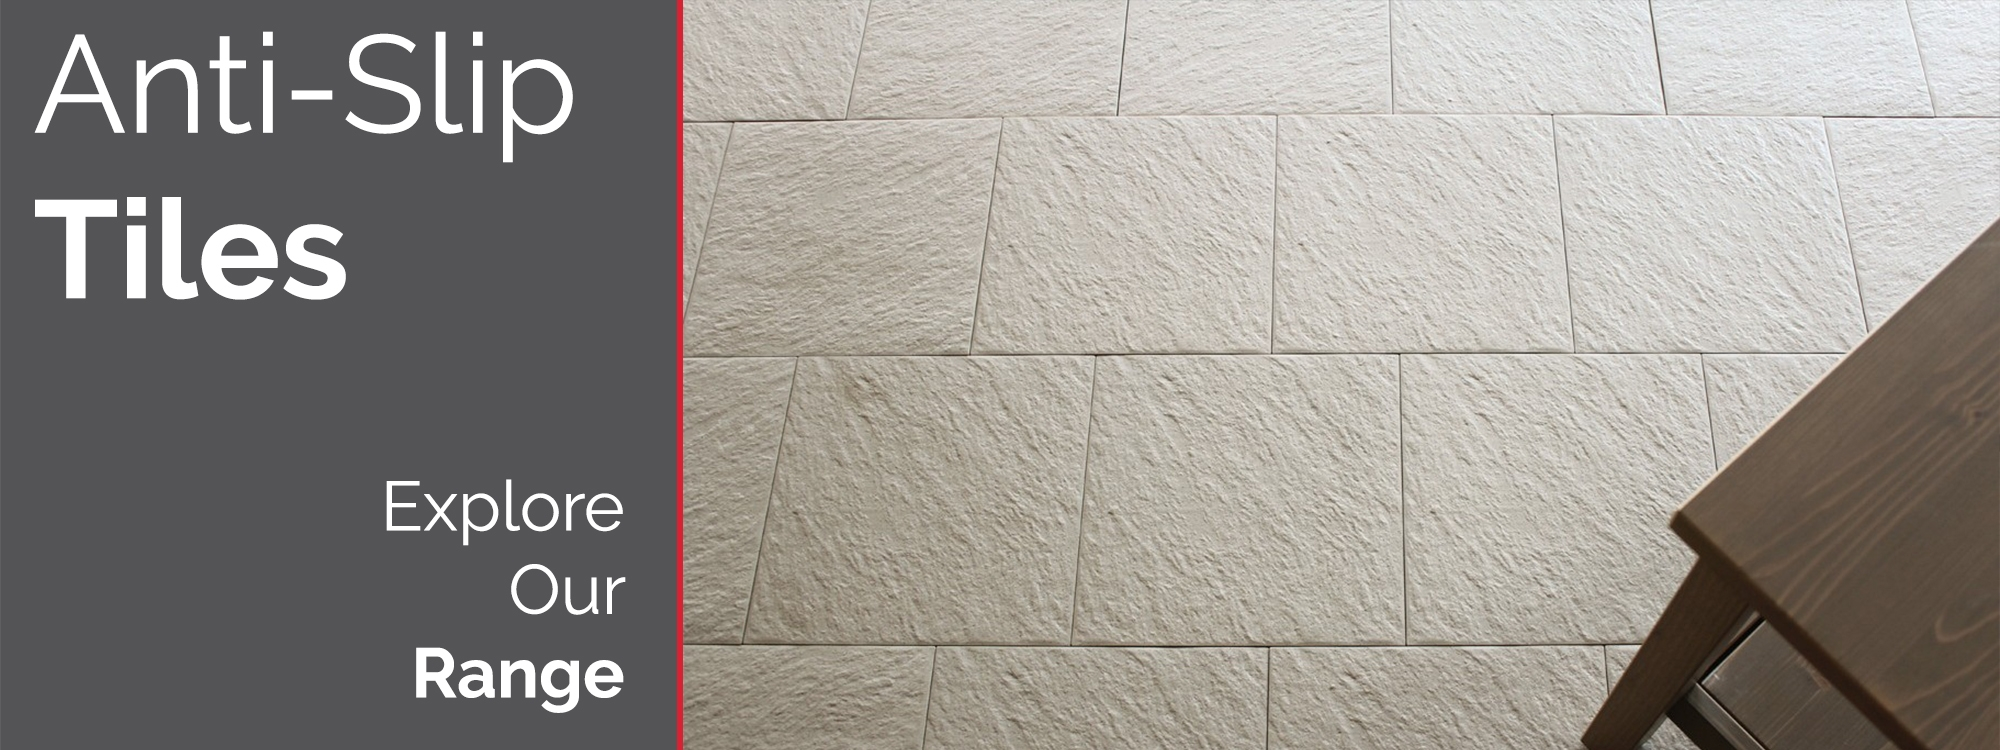 Anti Slip Tiles Tile Merchant